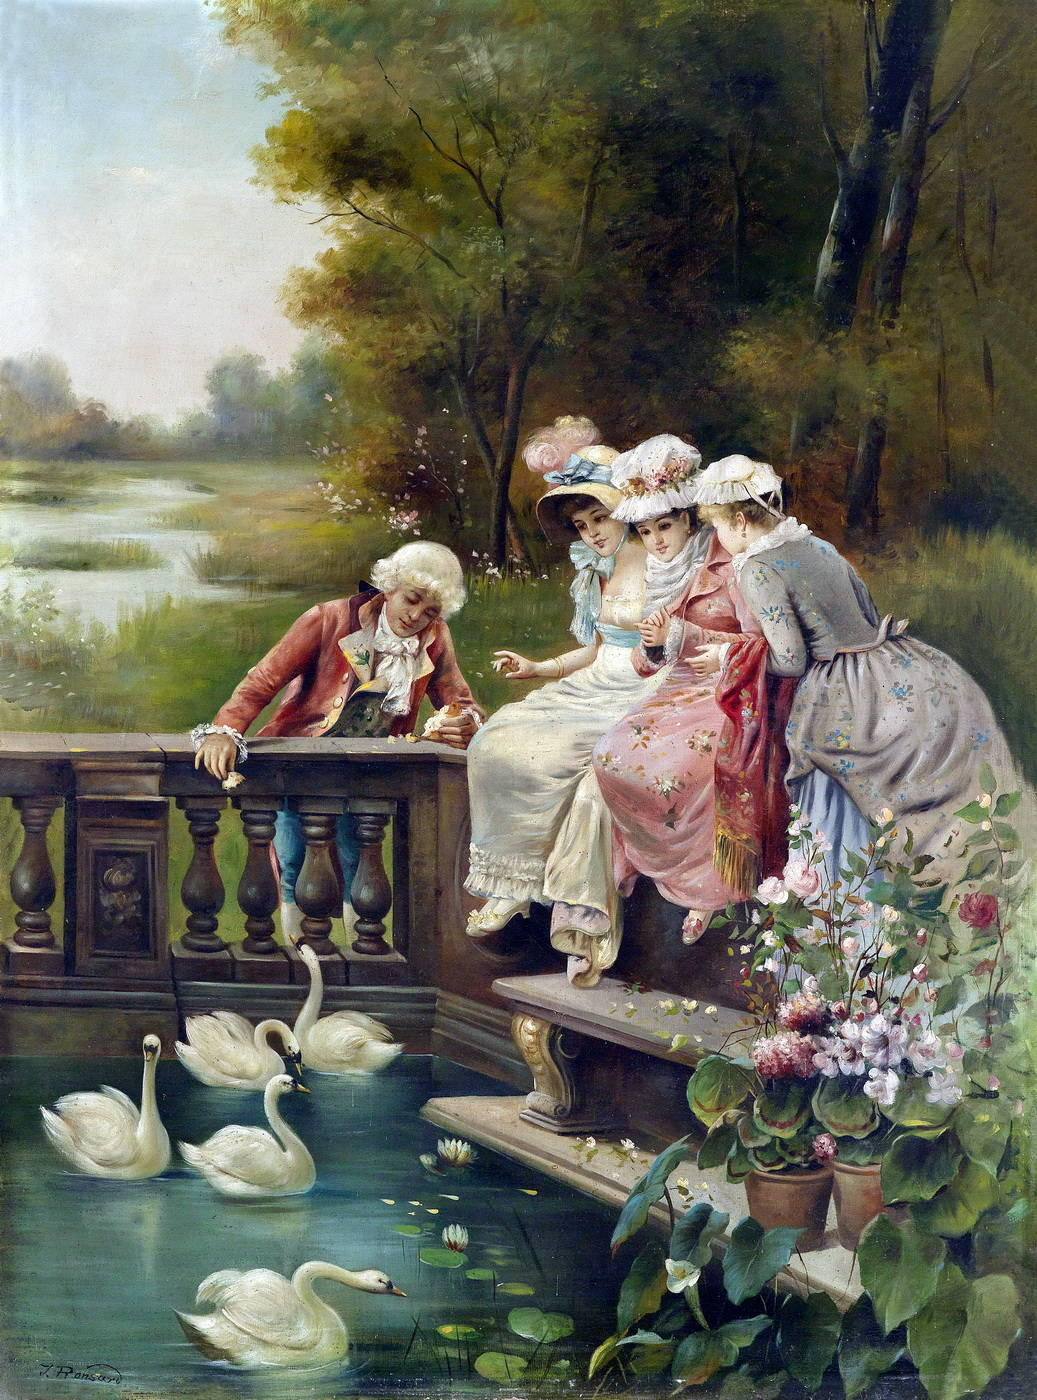 Три юнных леди и юноша кормят лебедей